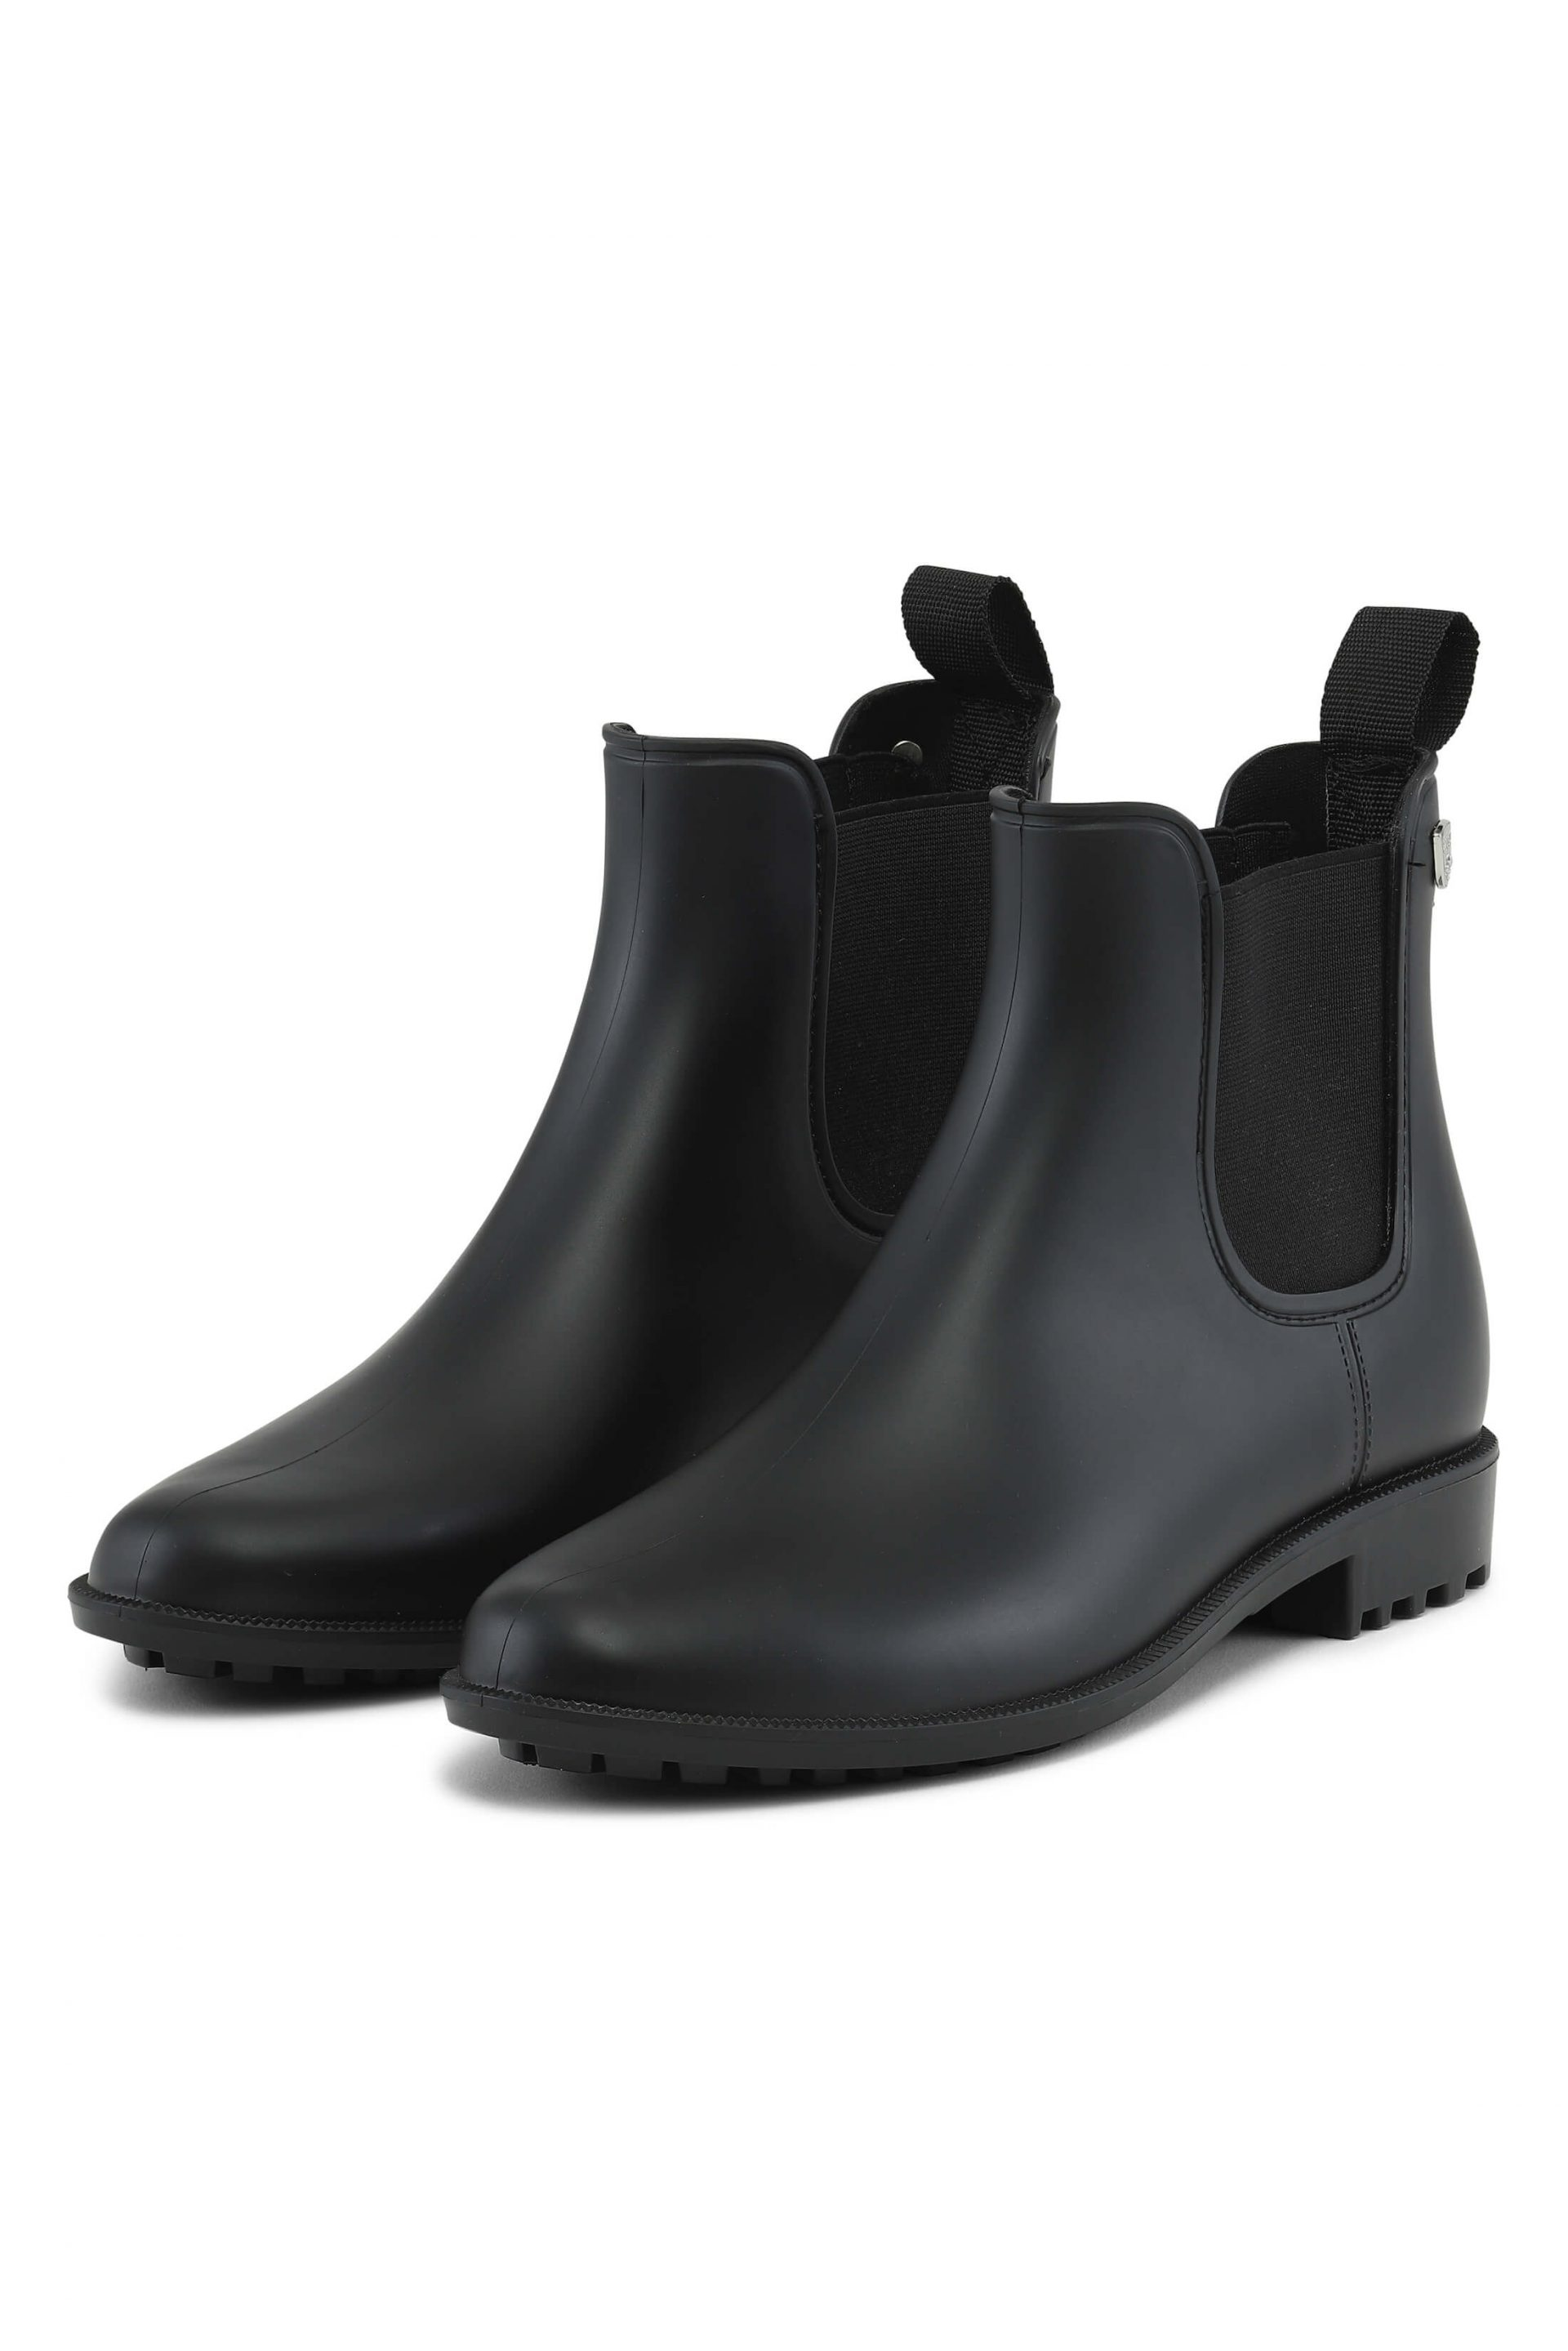 Black matte rainboots in a elegant design